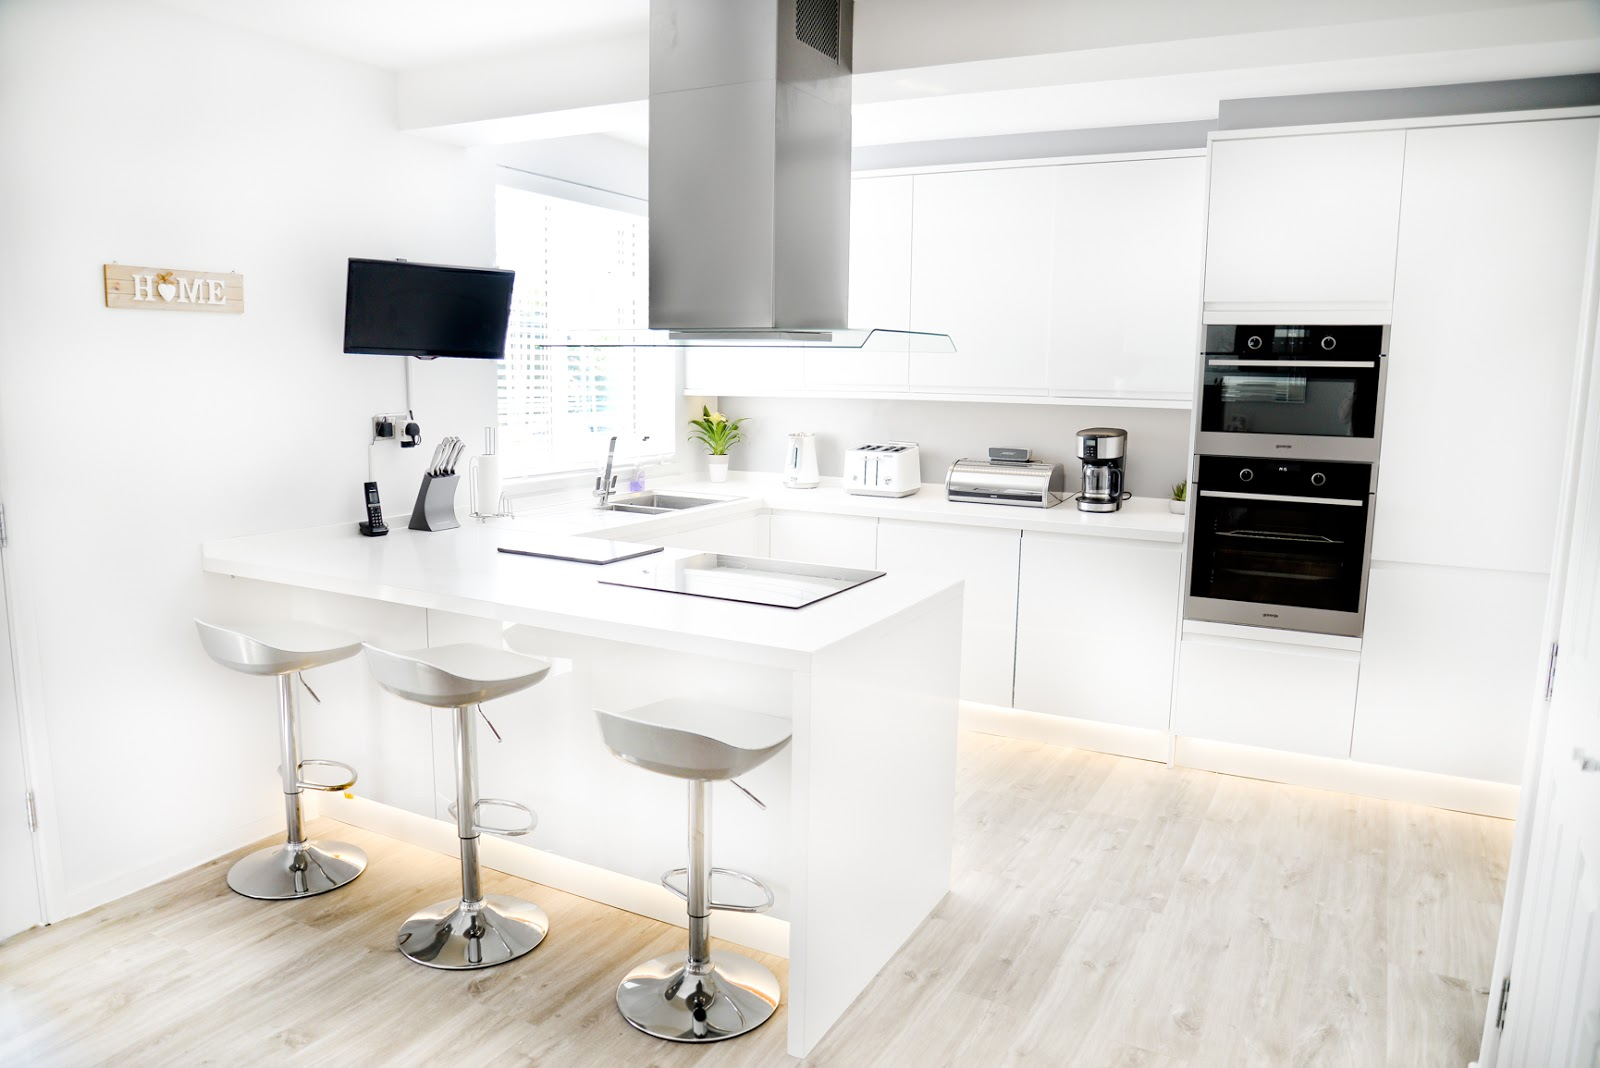 white modern Scandinavian style kitchen diner, modern white kitchen, modern rustic kitchen, howdens clerkenwell gloss kitchen